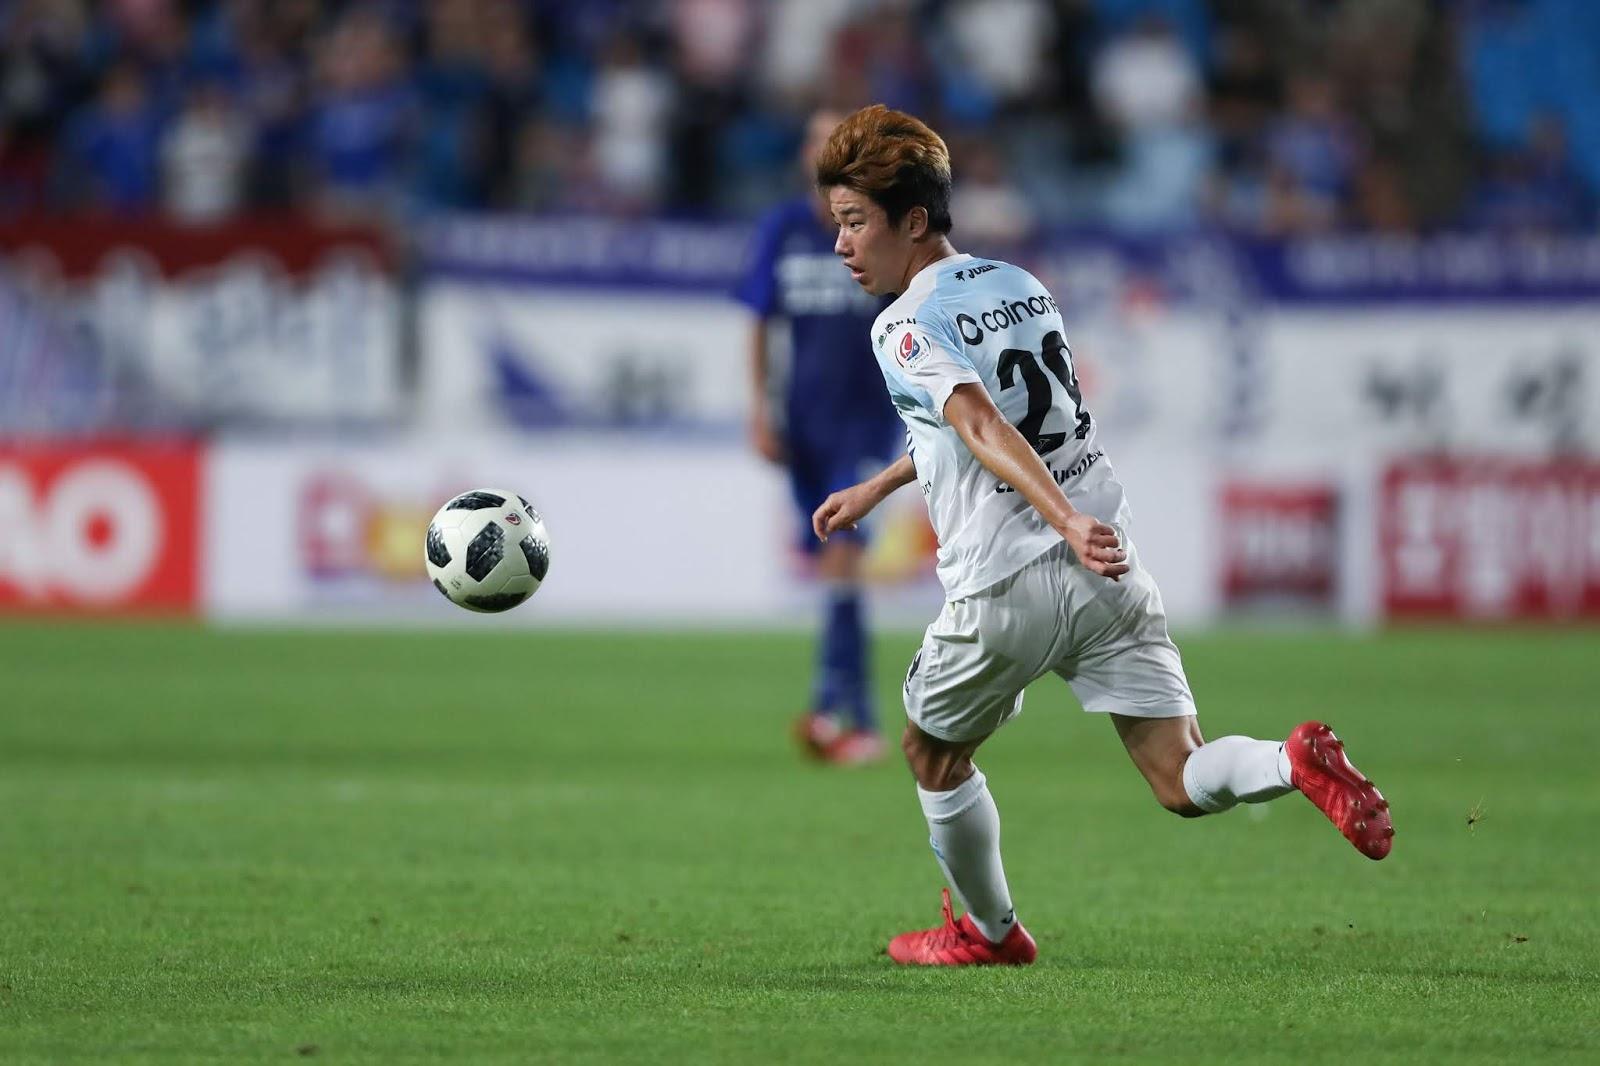 K League 1 Preview: Gangwon FC vs Daegu FC